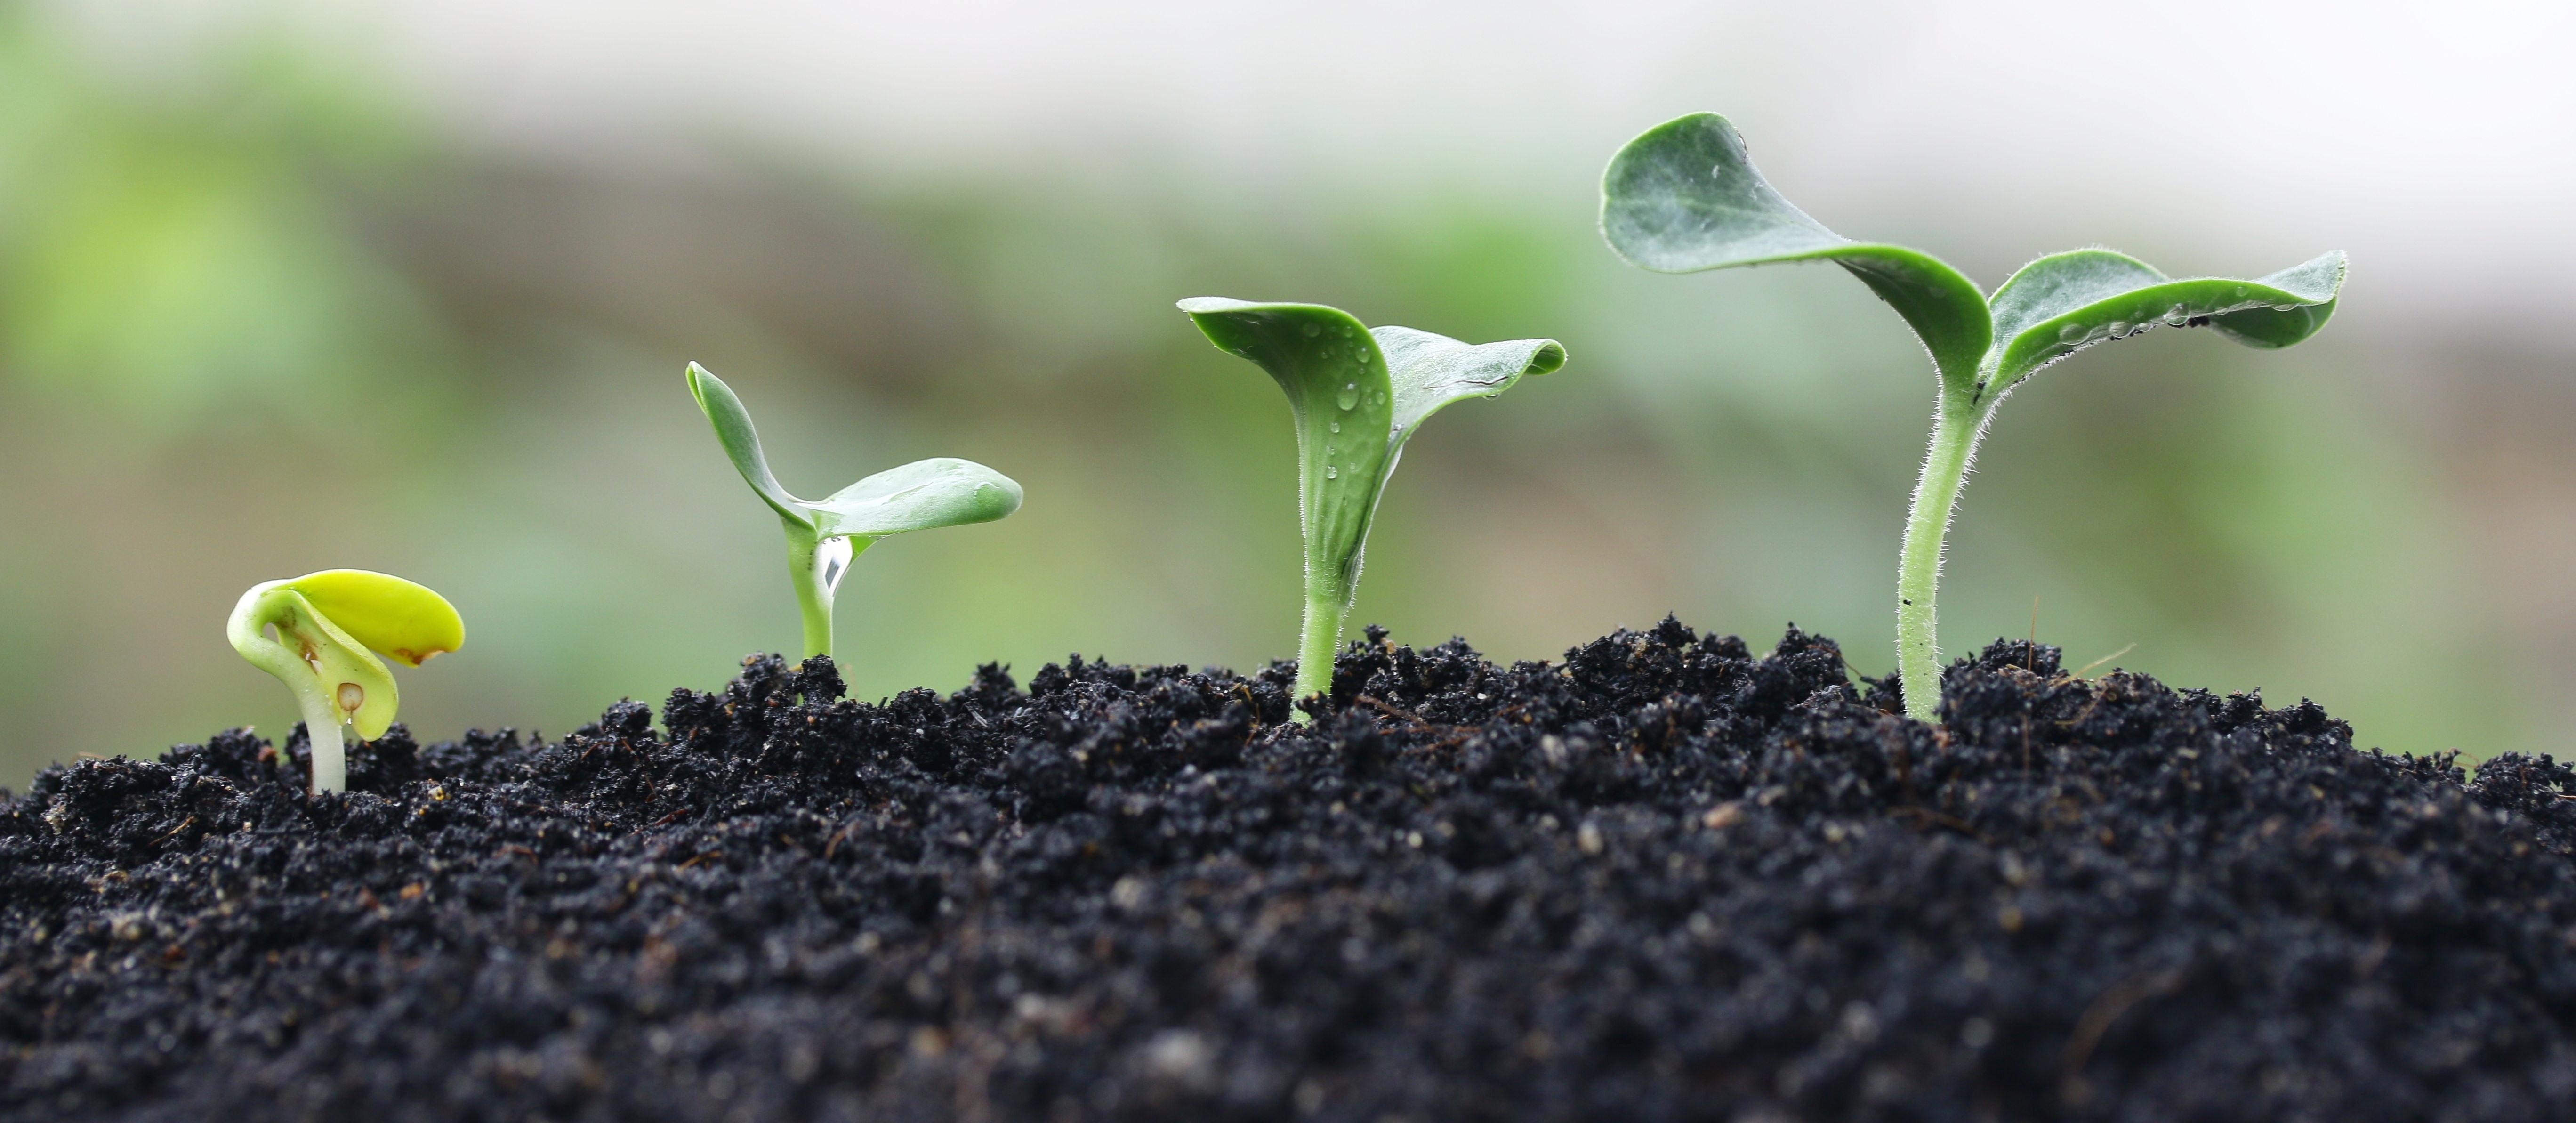 plant_growing_stock_image-554179-edited.jpg